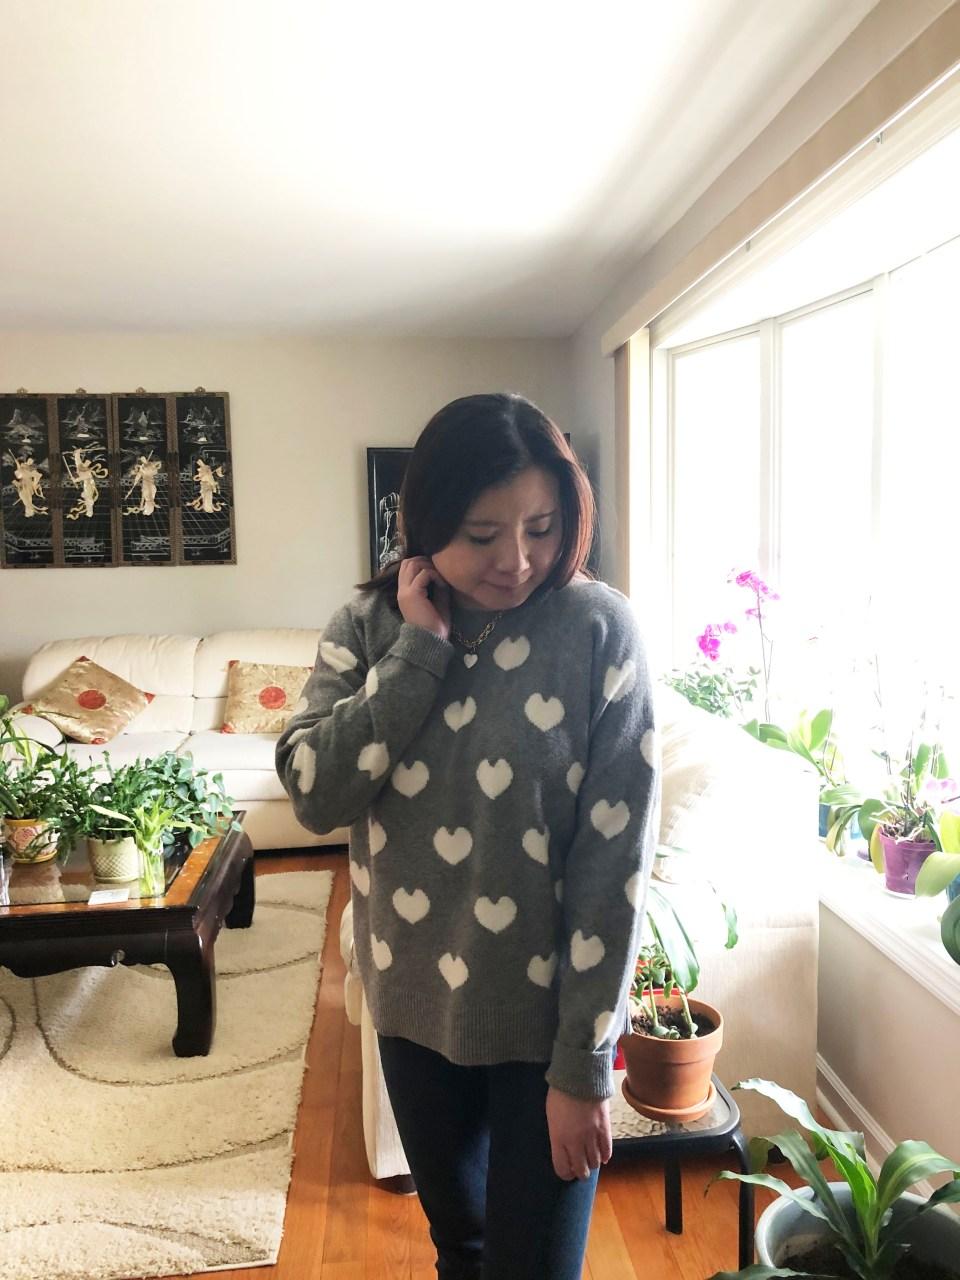 White Heart Sweater 3